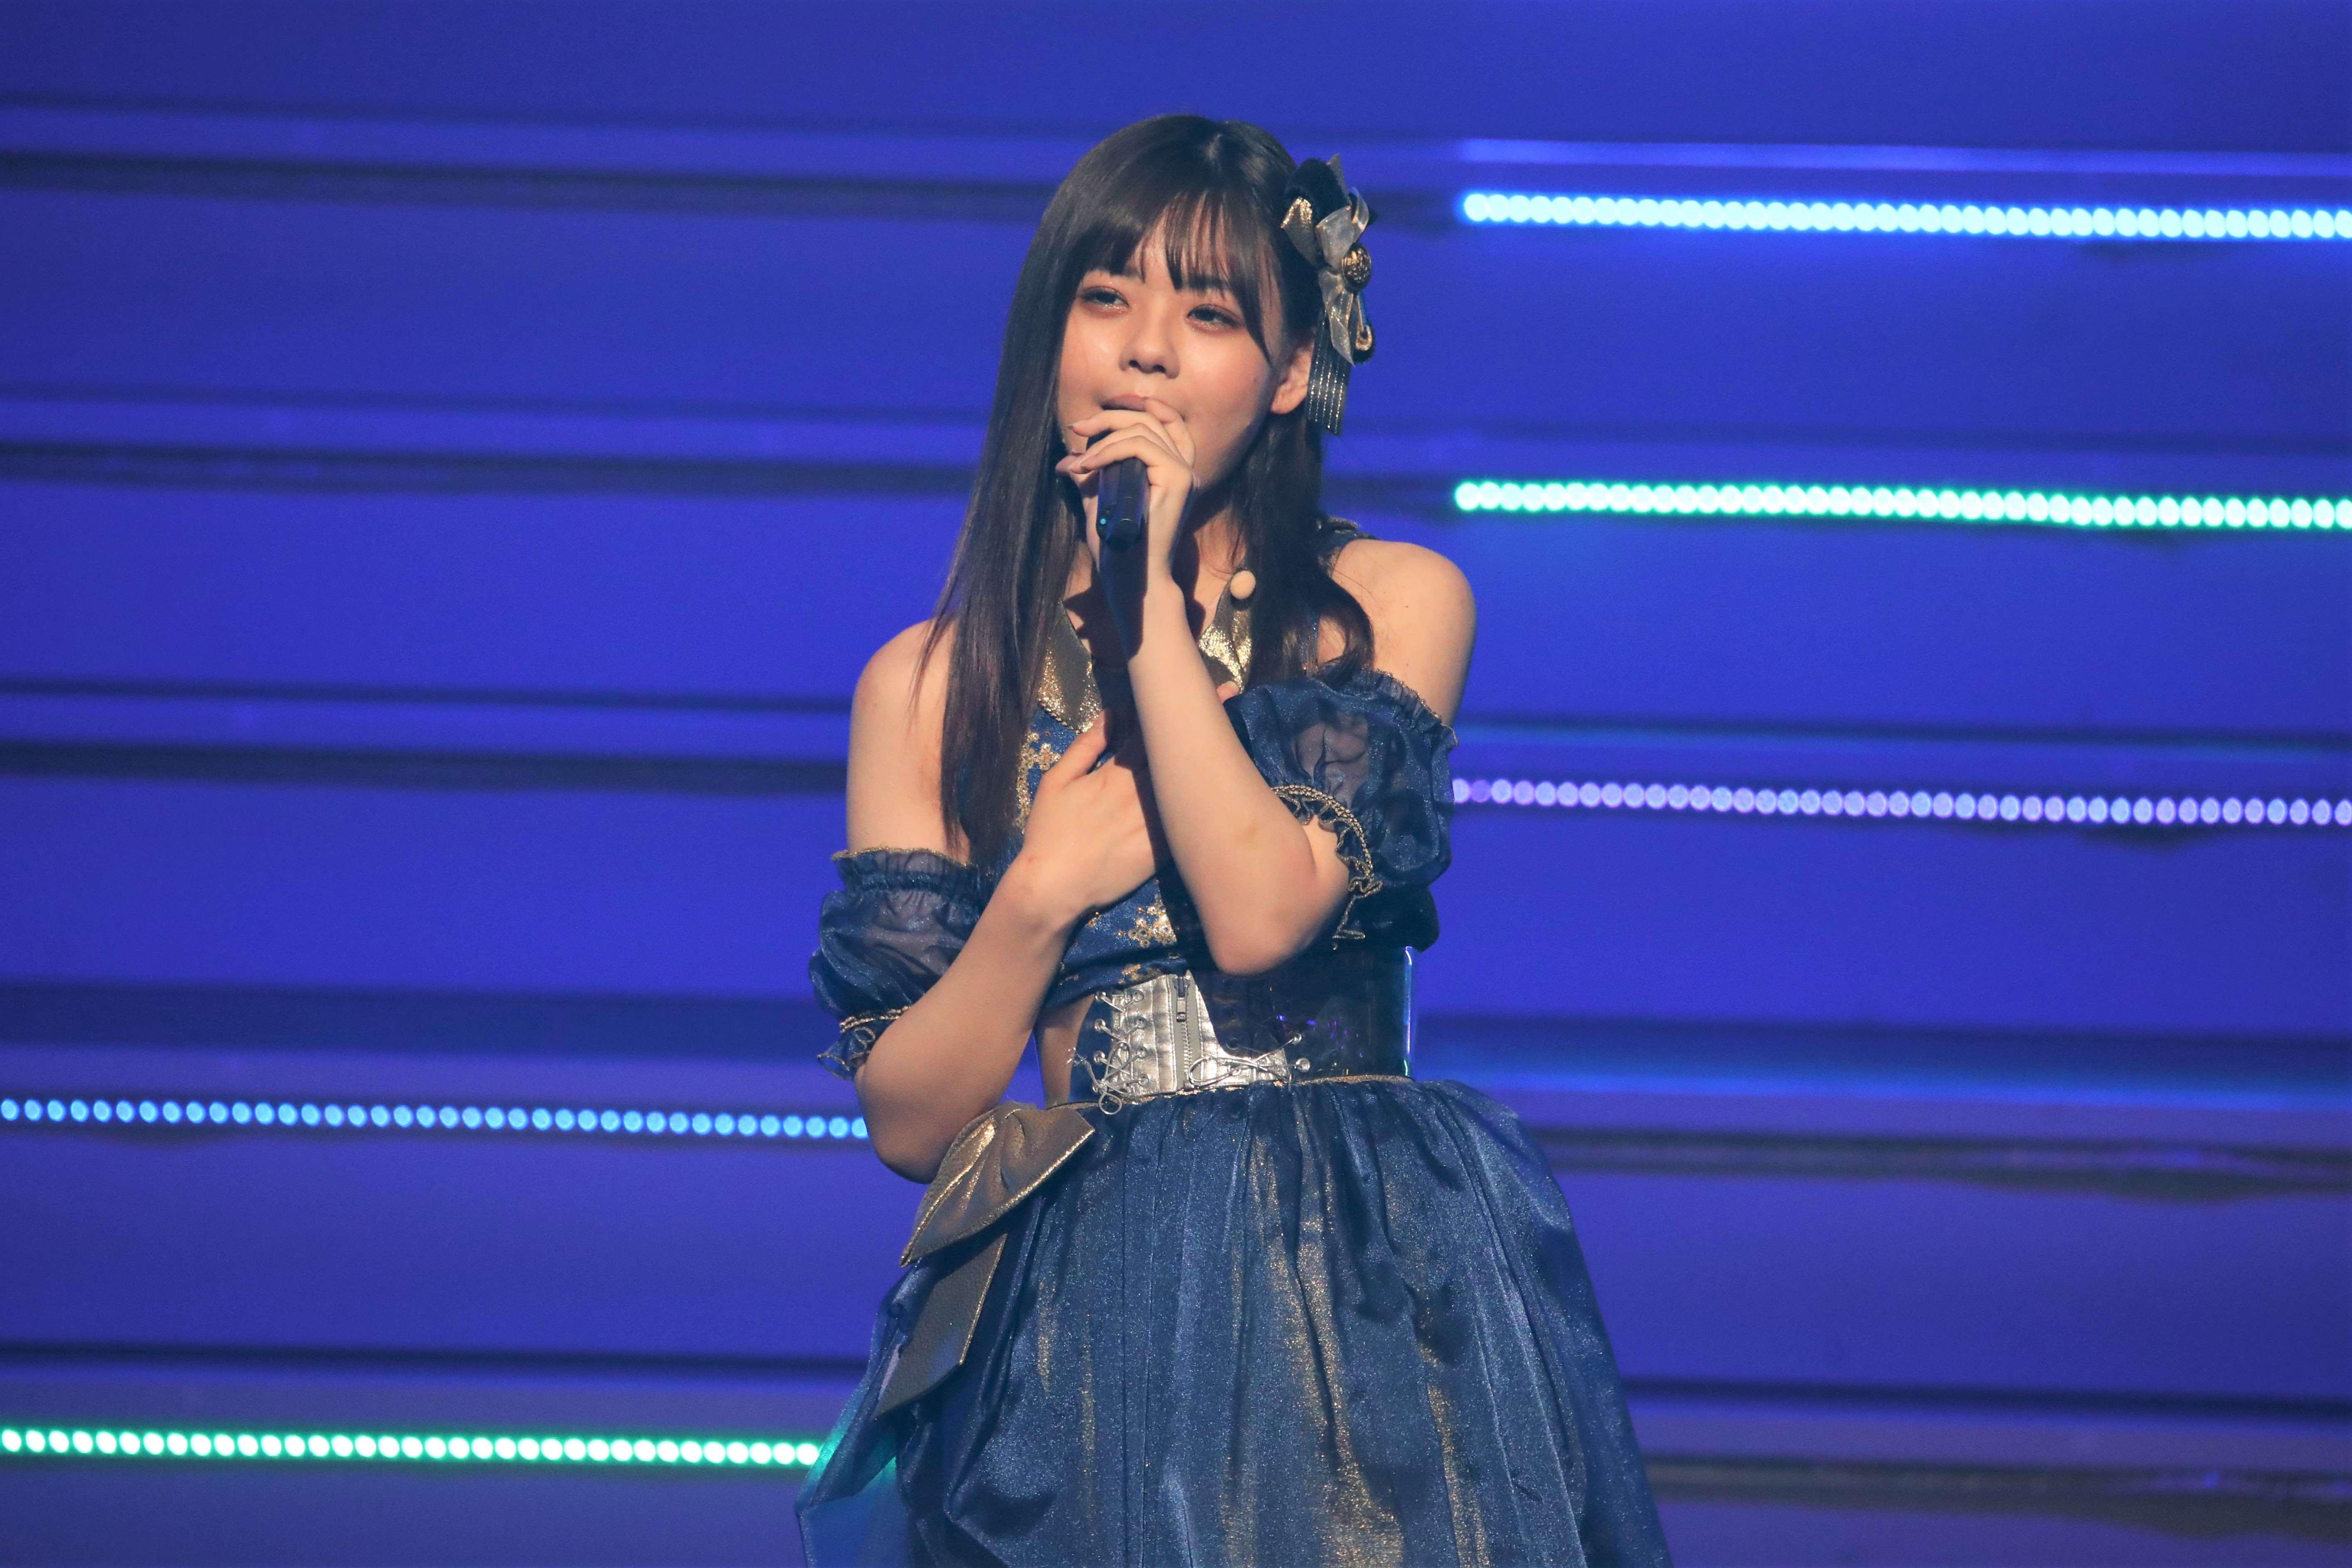 ©AKB48 THE AUDISHOW製作委員会 無断アップロード及び転送は一切禁止です。